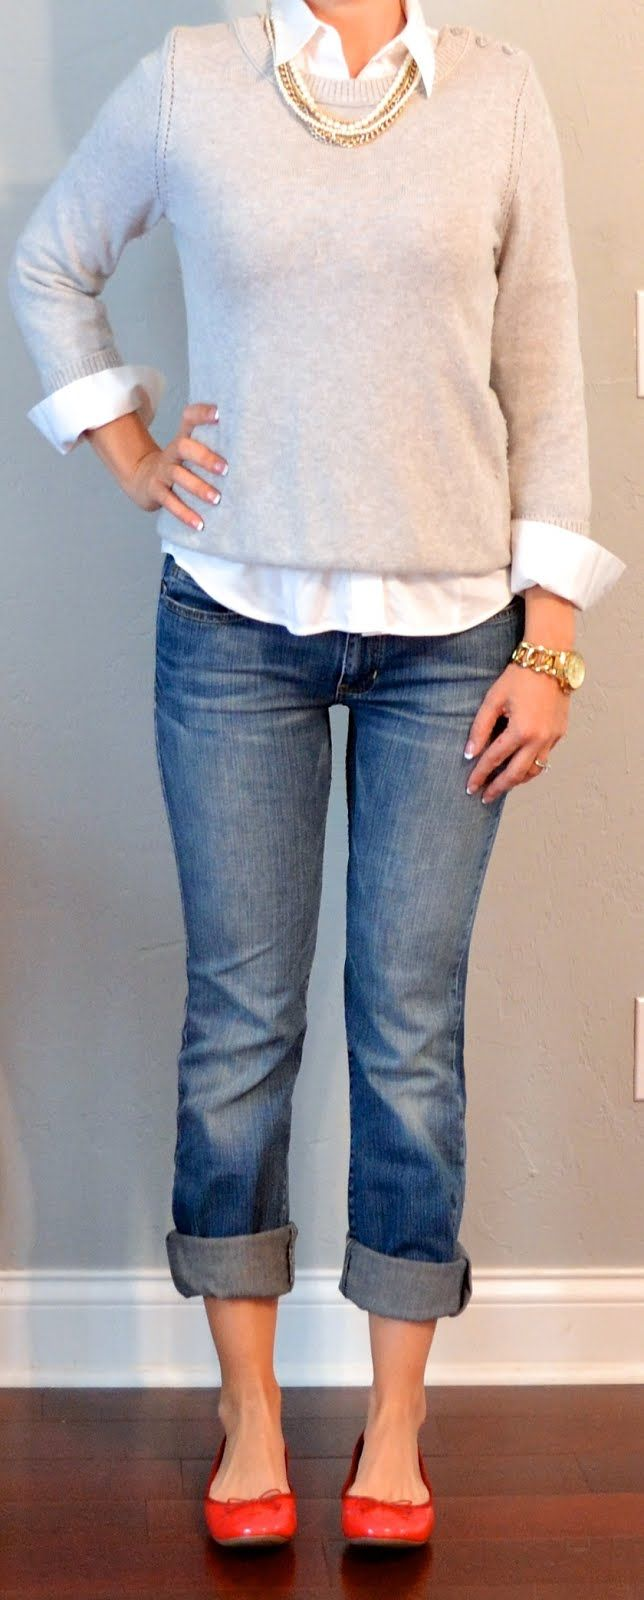 white button down shirt, grey sweater, boyfriend jeans